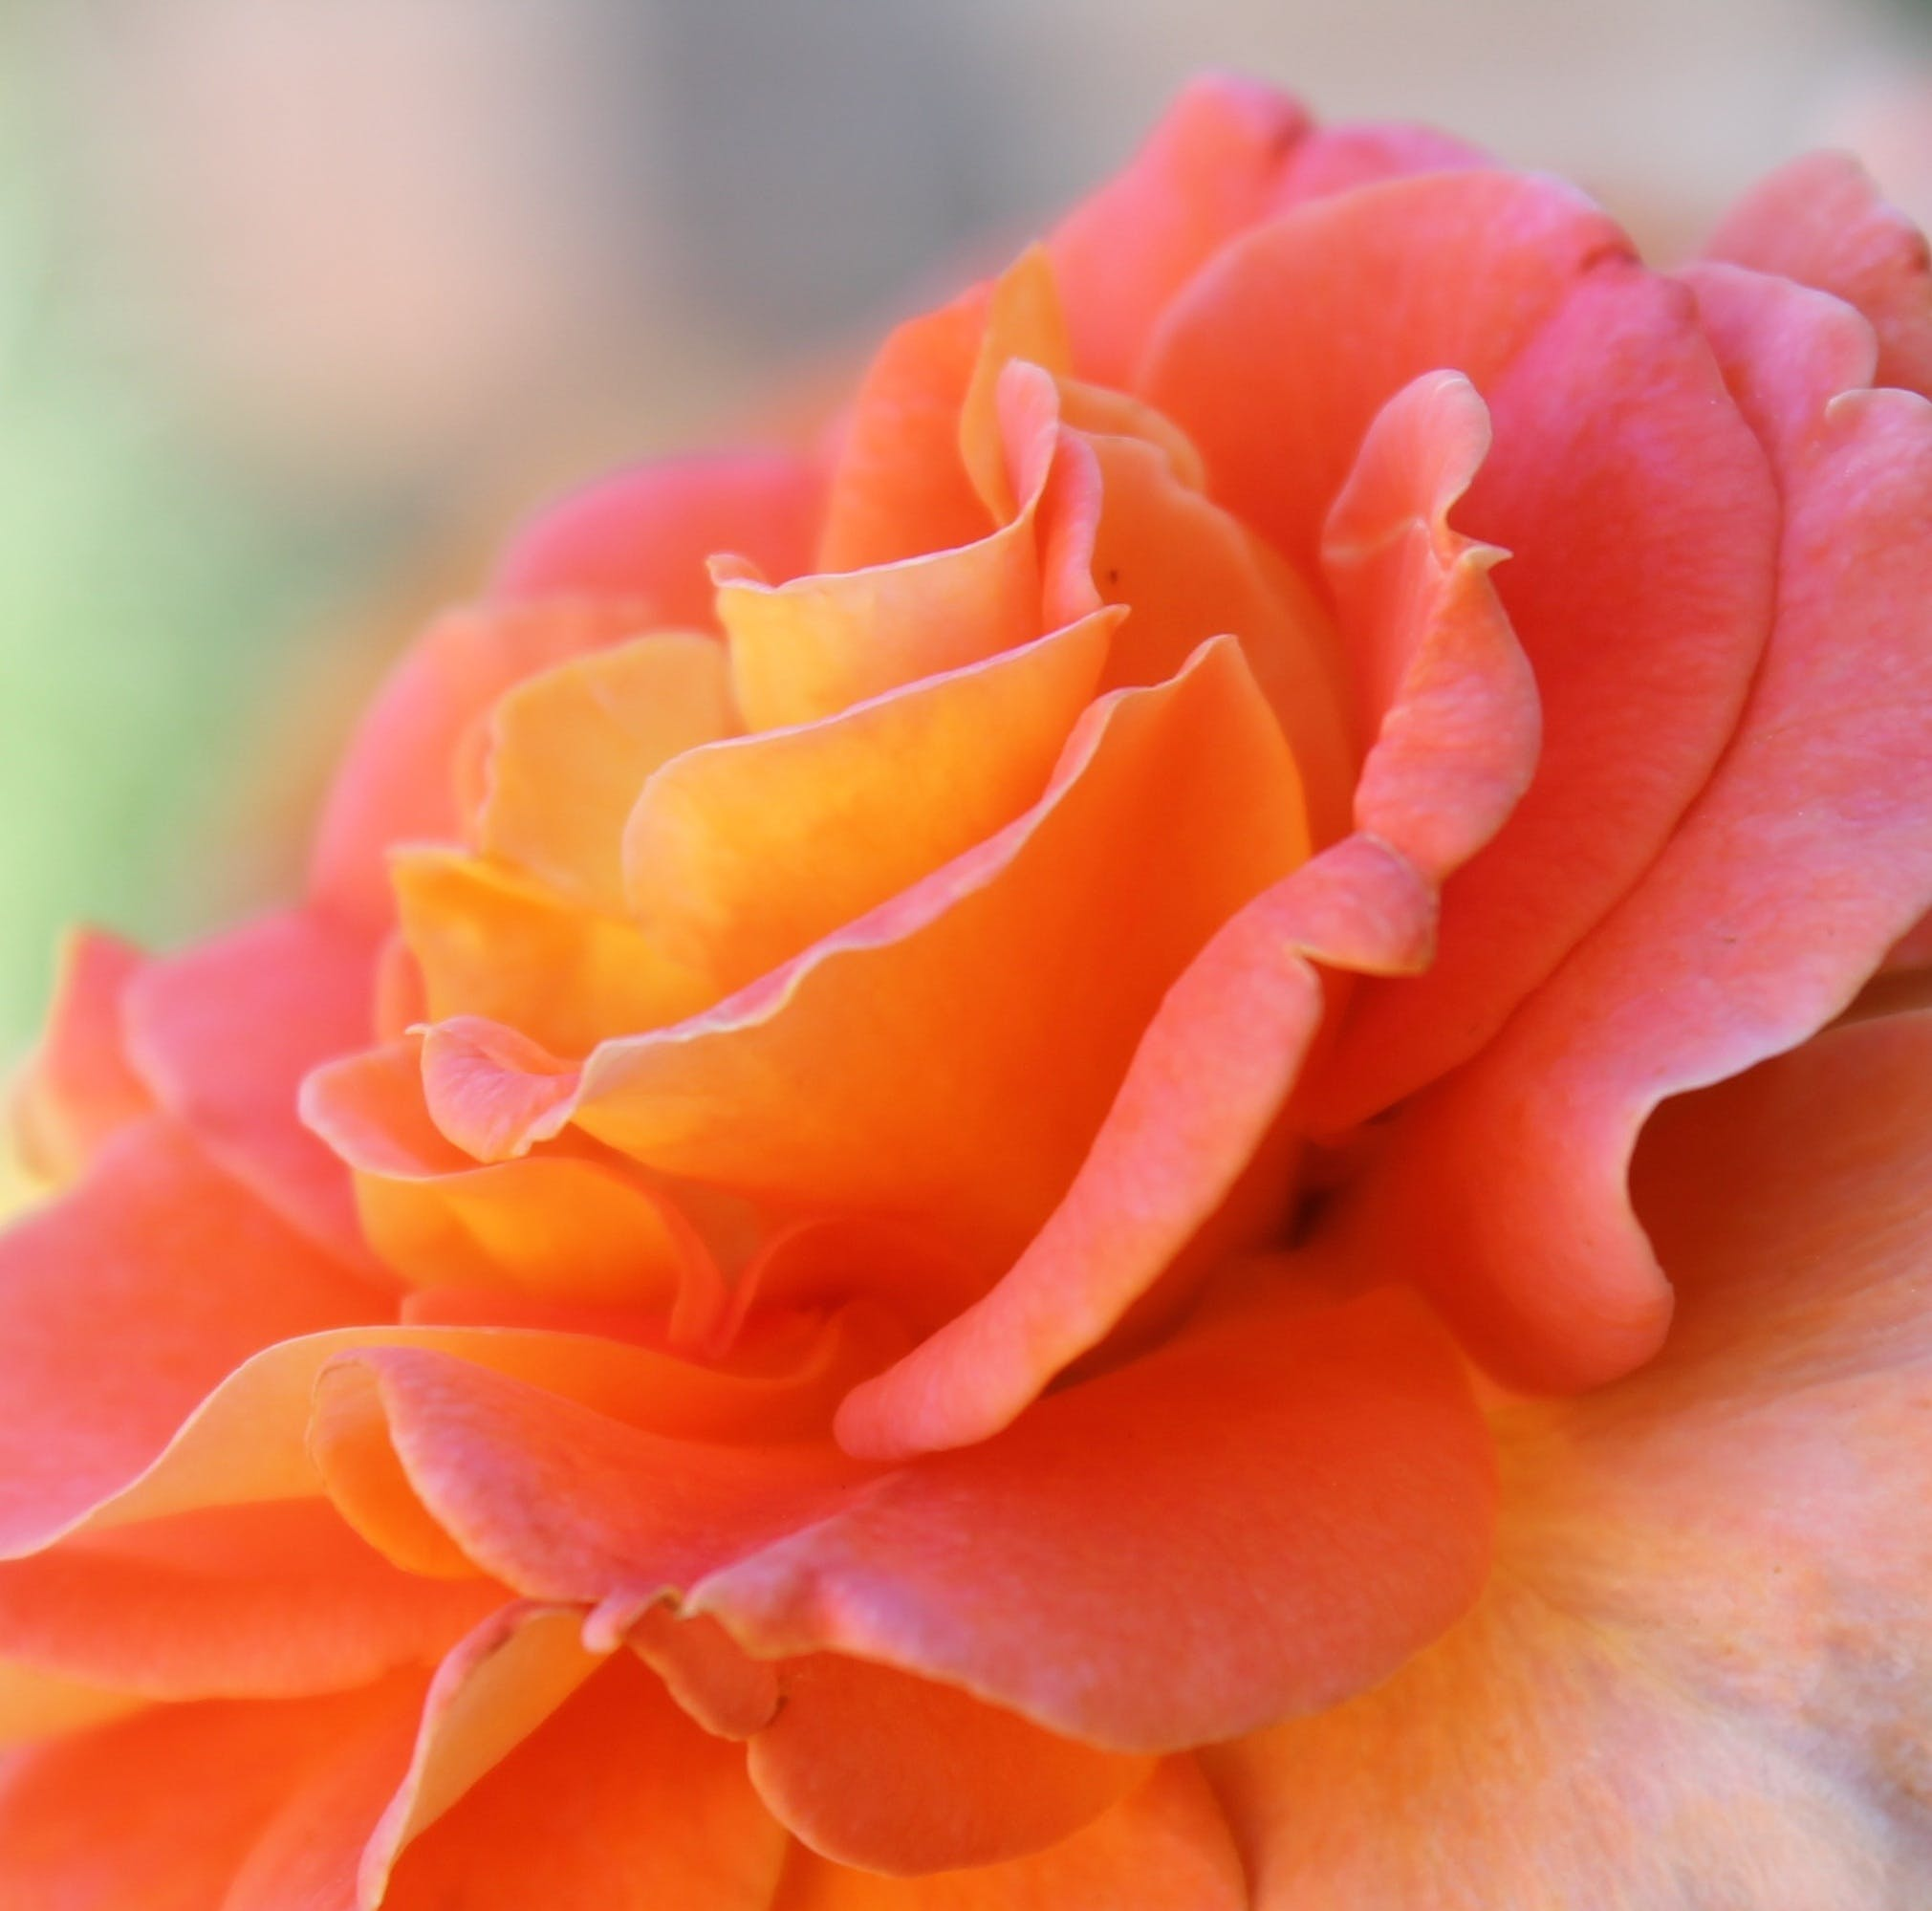 Free stock photo of nature, romantic, texture, garden